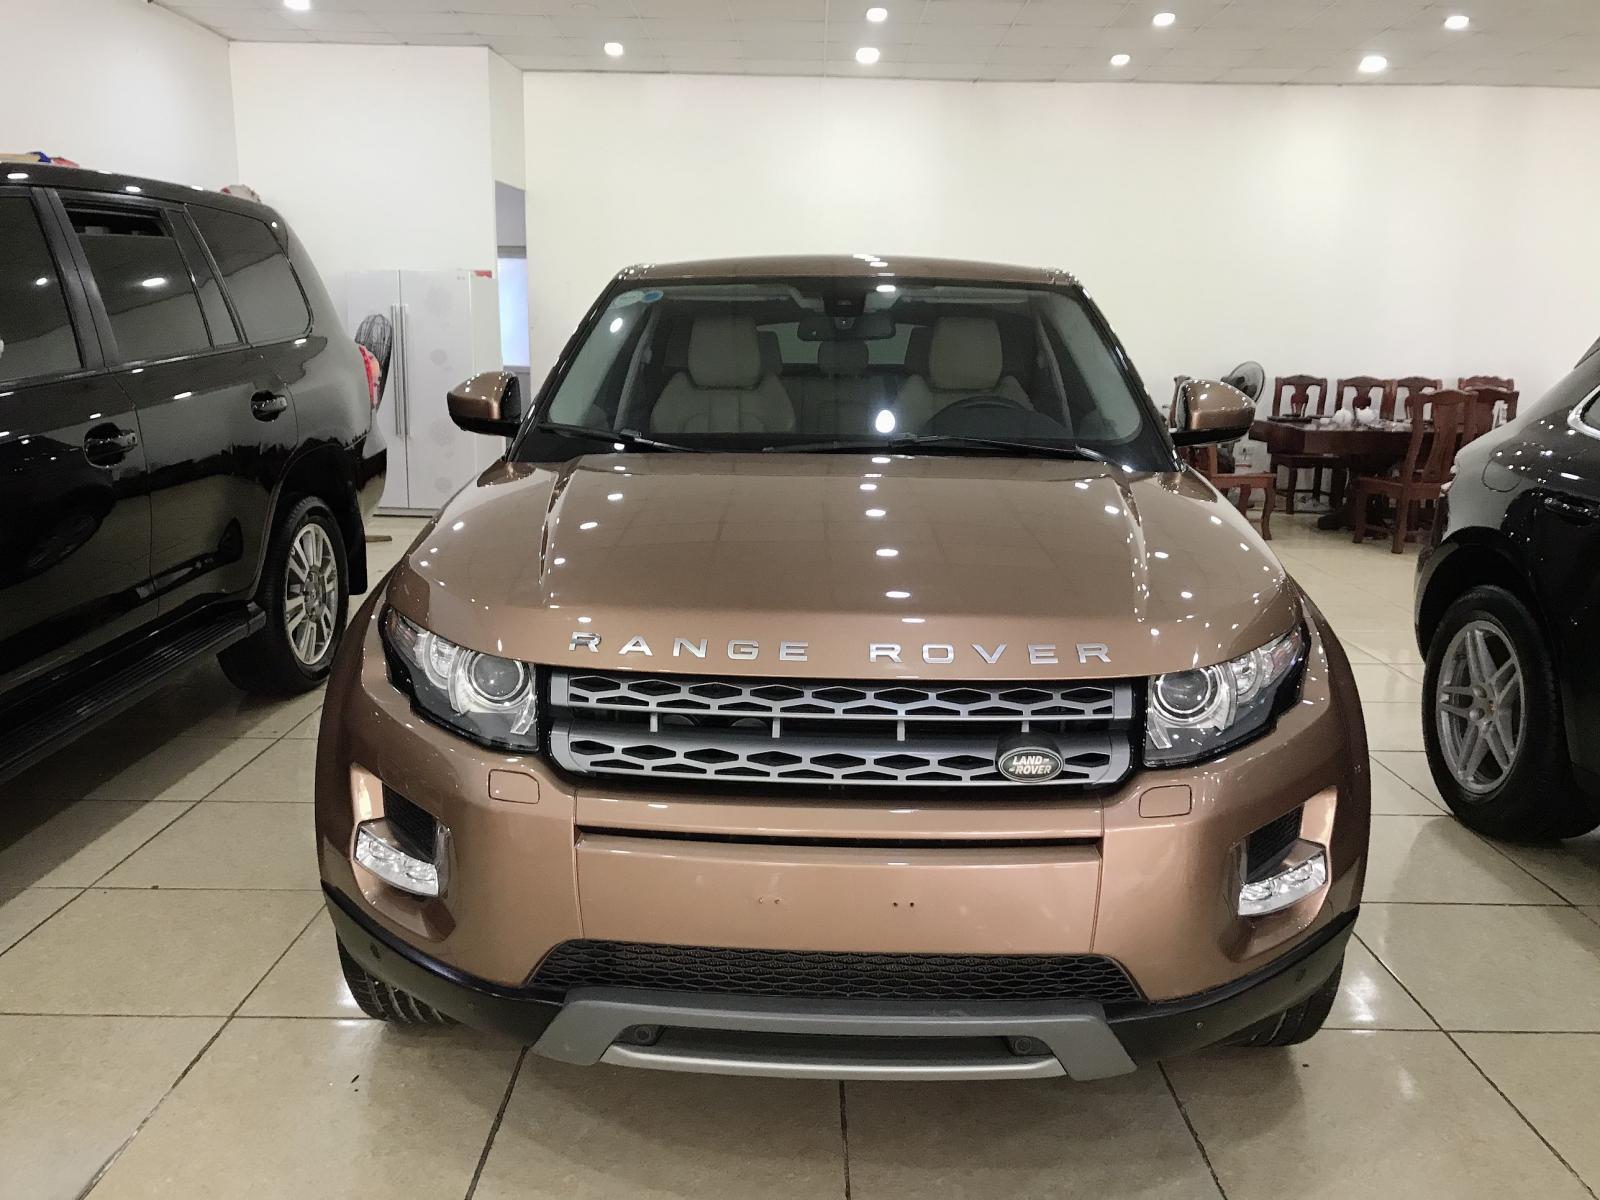 Bán LandRover Range Rover Evoque Pure Premium 2.0,đăng ký 2016, LH 0906223838